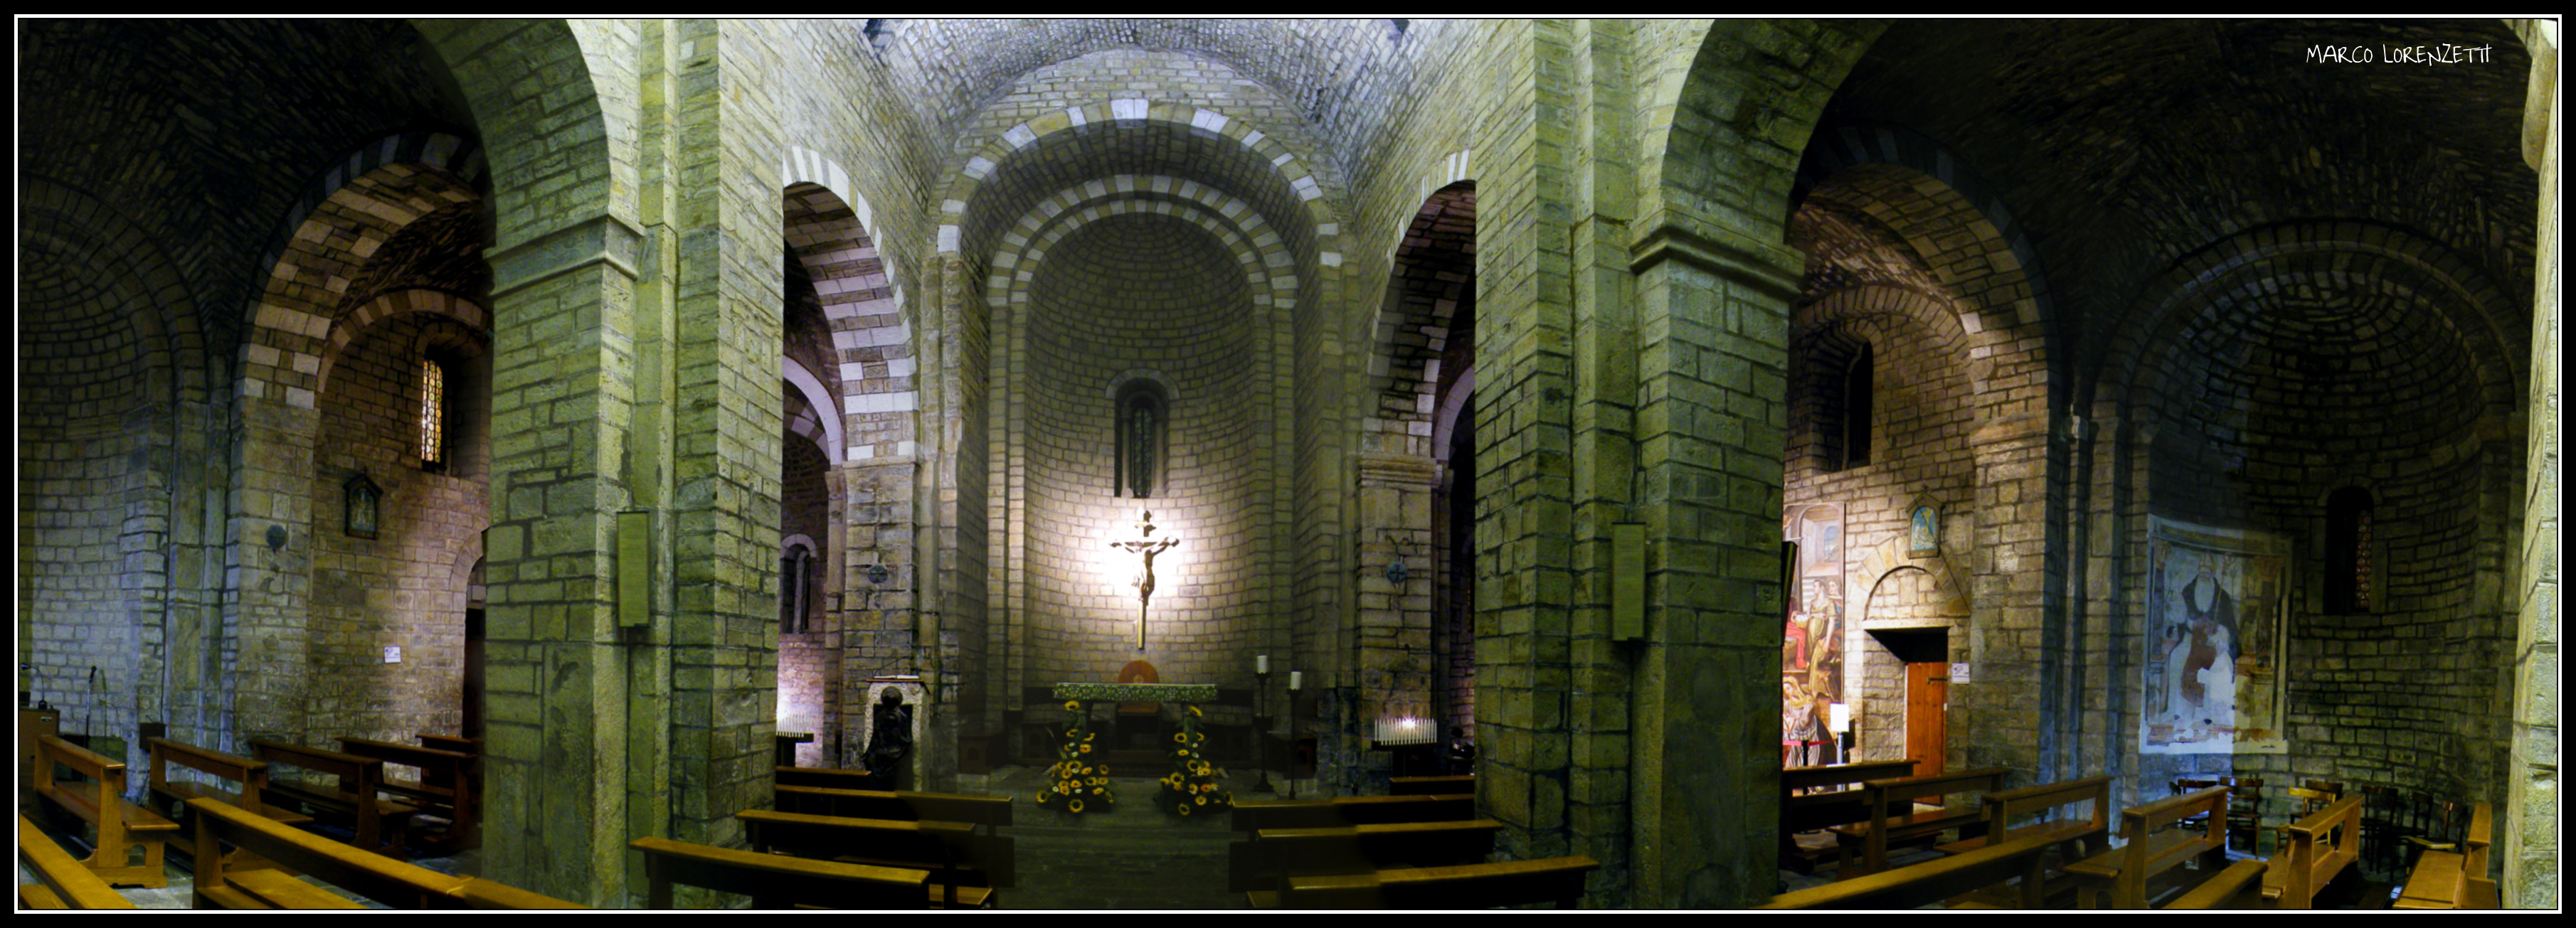 MOIE DI MAIOLATI SP. (AN) - INSIDE ST.MARY CHURCH by MarcoLorenzetti